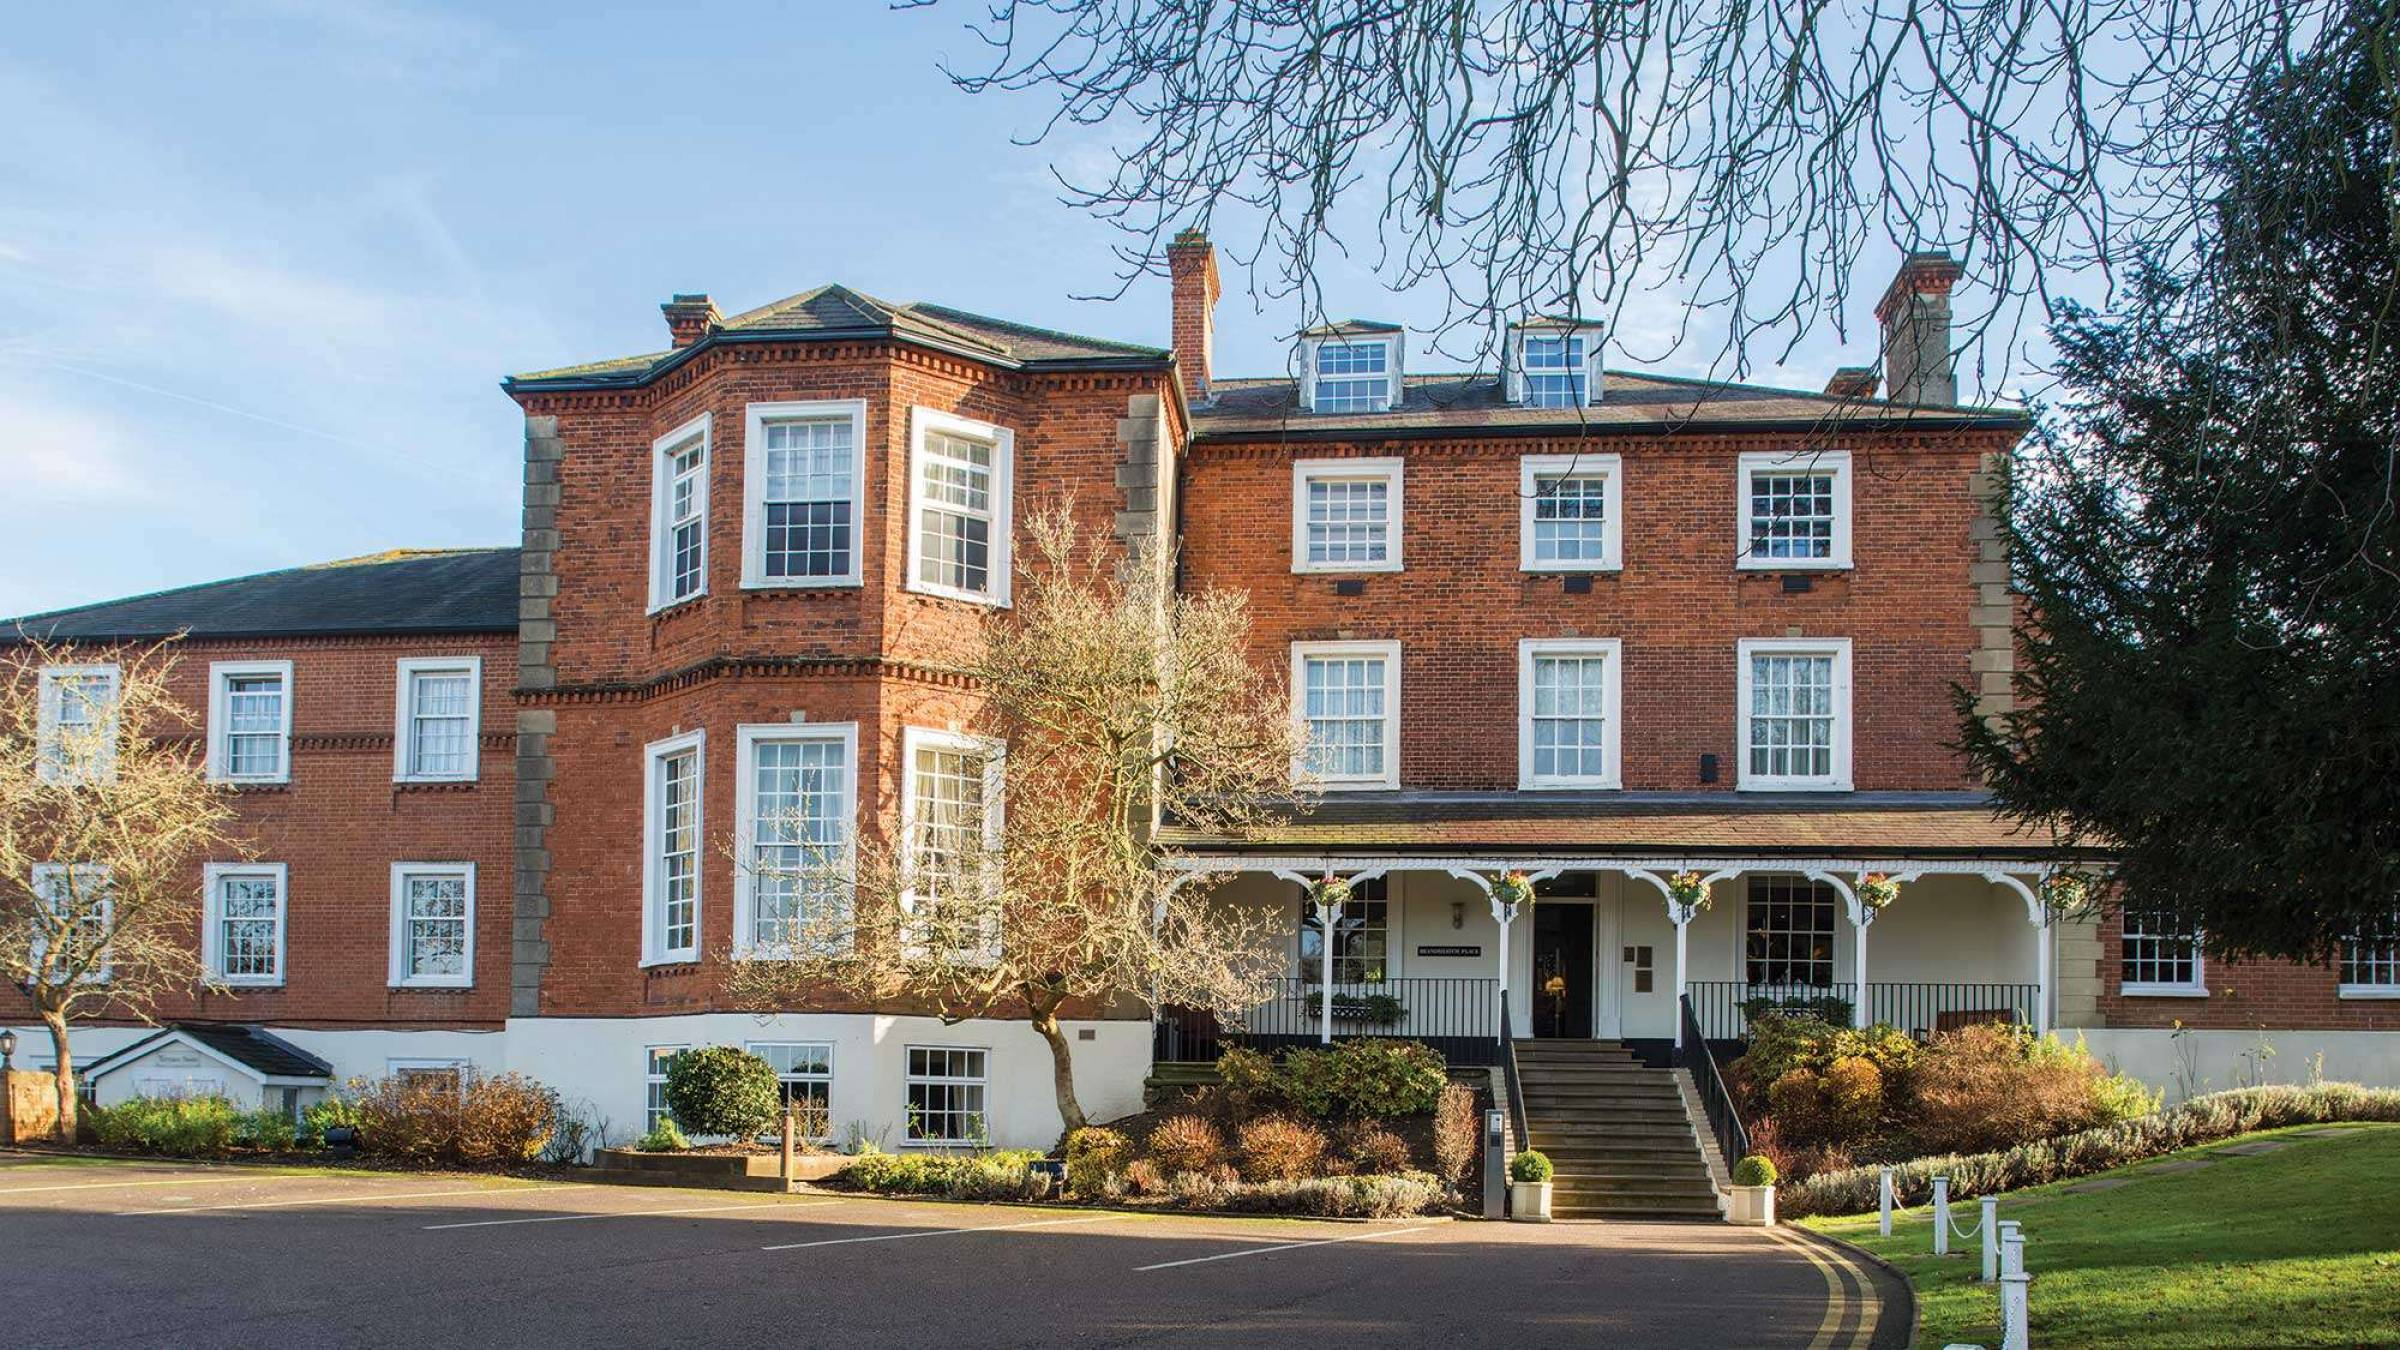 Brandshatch Place Hotel & Spa, Fawkham, Kent